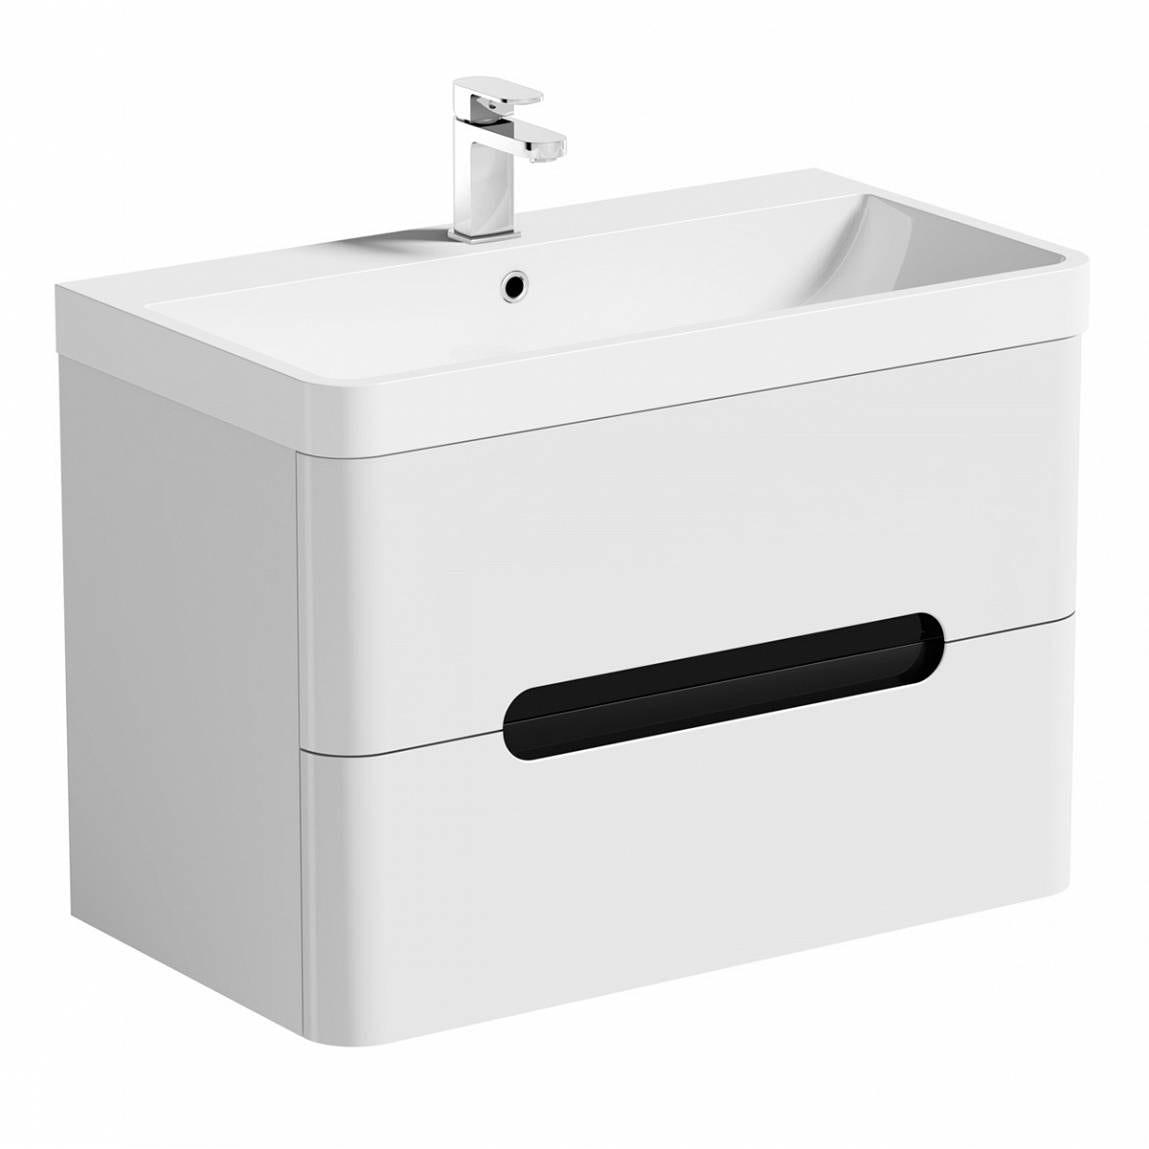 ModeEllis select essenwall hung vanity drawer unit and basin 800mm